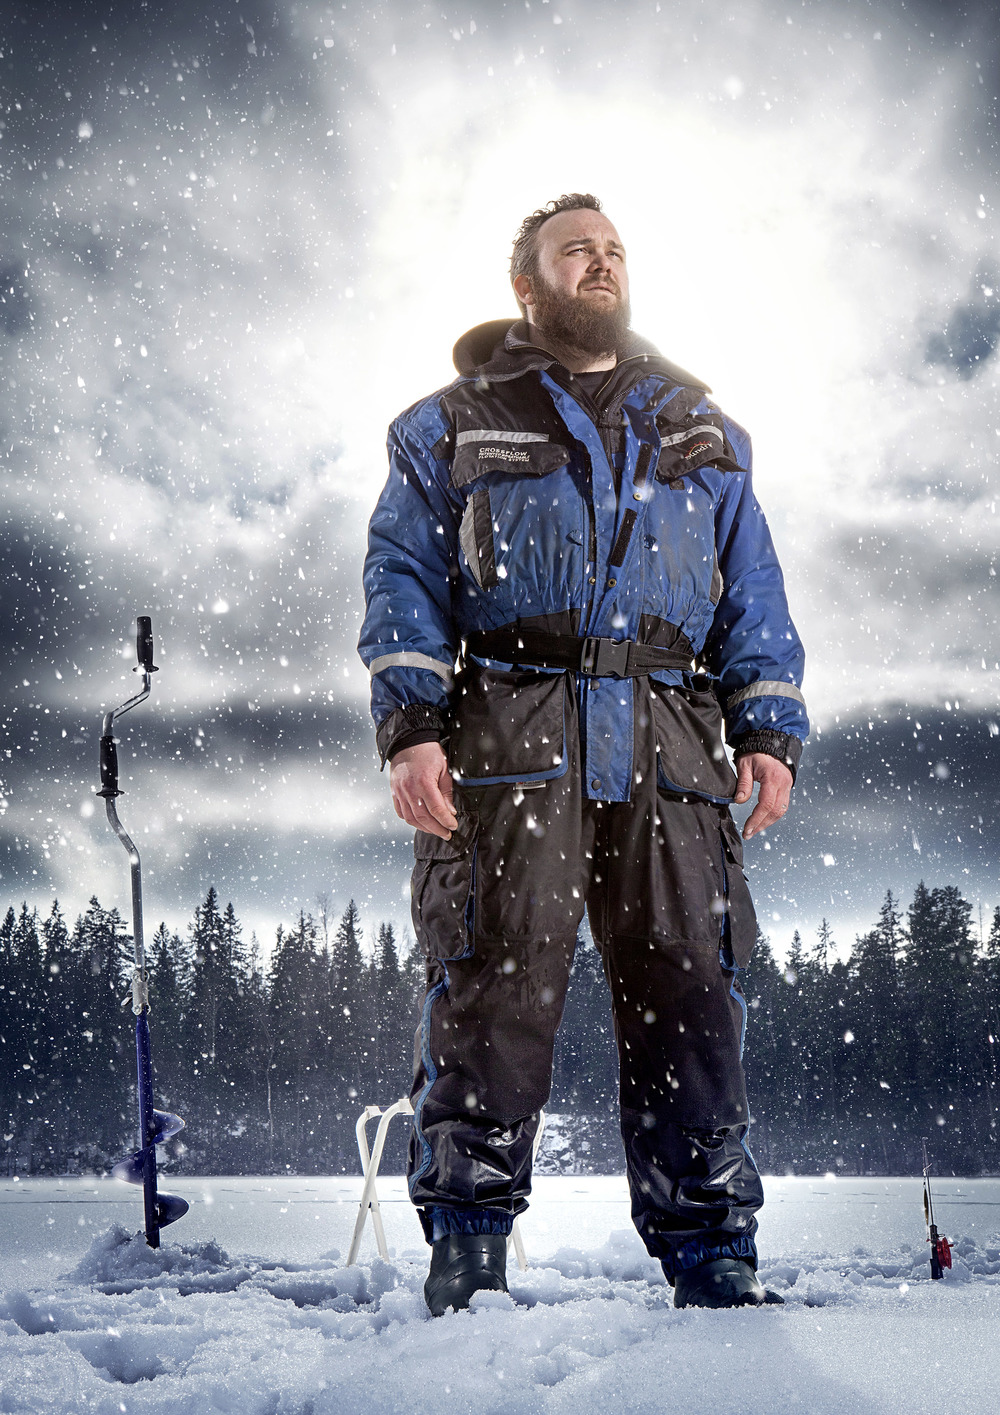 icefishing0005.jpg